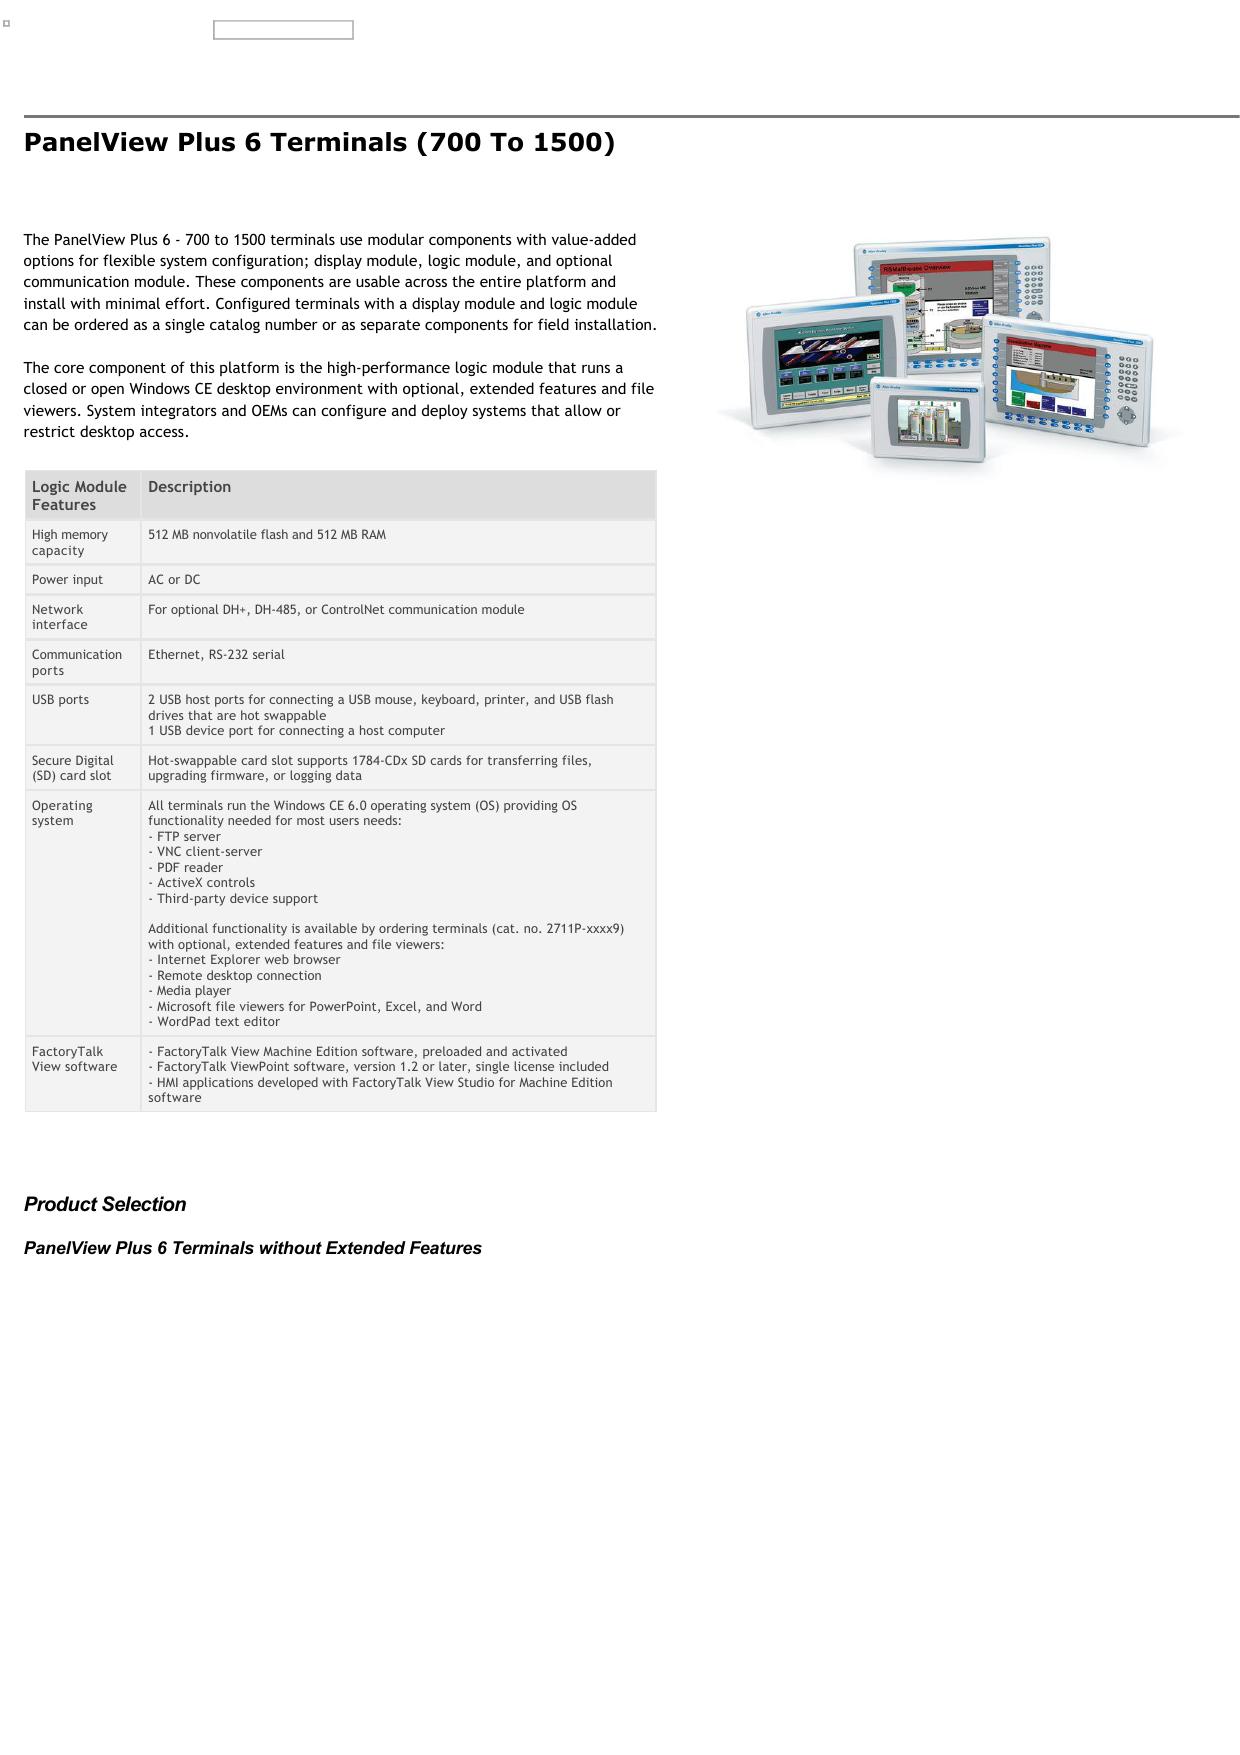 PanelView Plus 6 Terminals (700 to 1500)   manualzz com